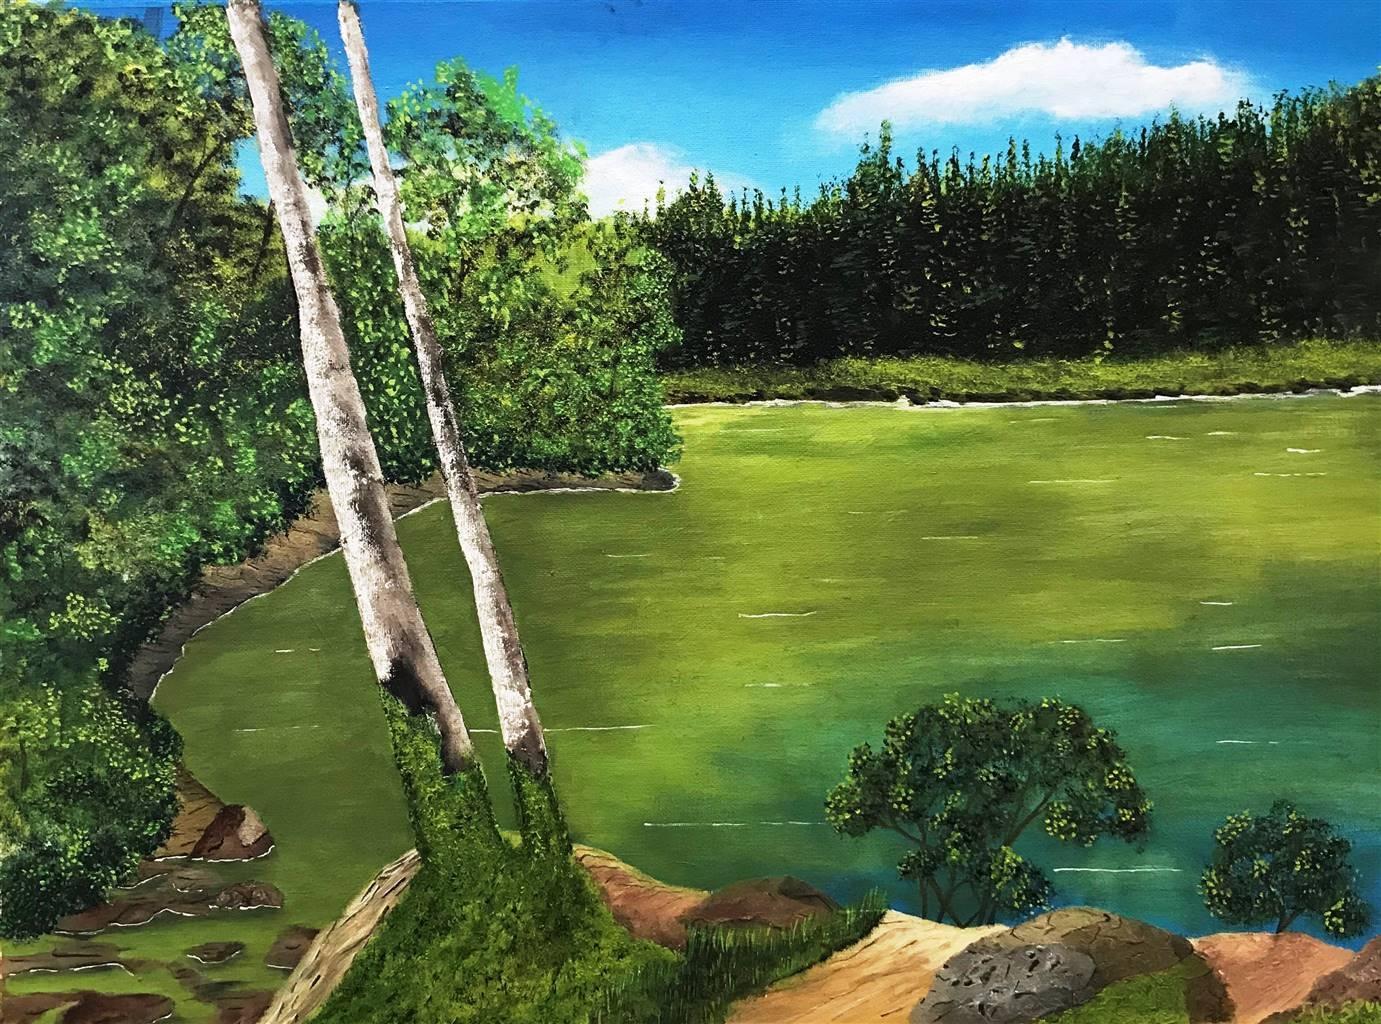 Johan van der Spuy, Natures Serenity, Oil on Canvas, 17 x 23 image